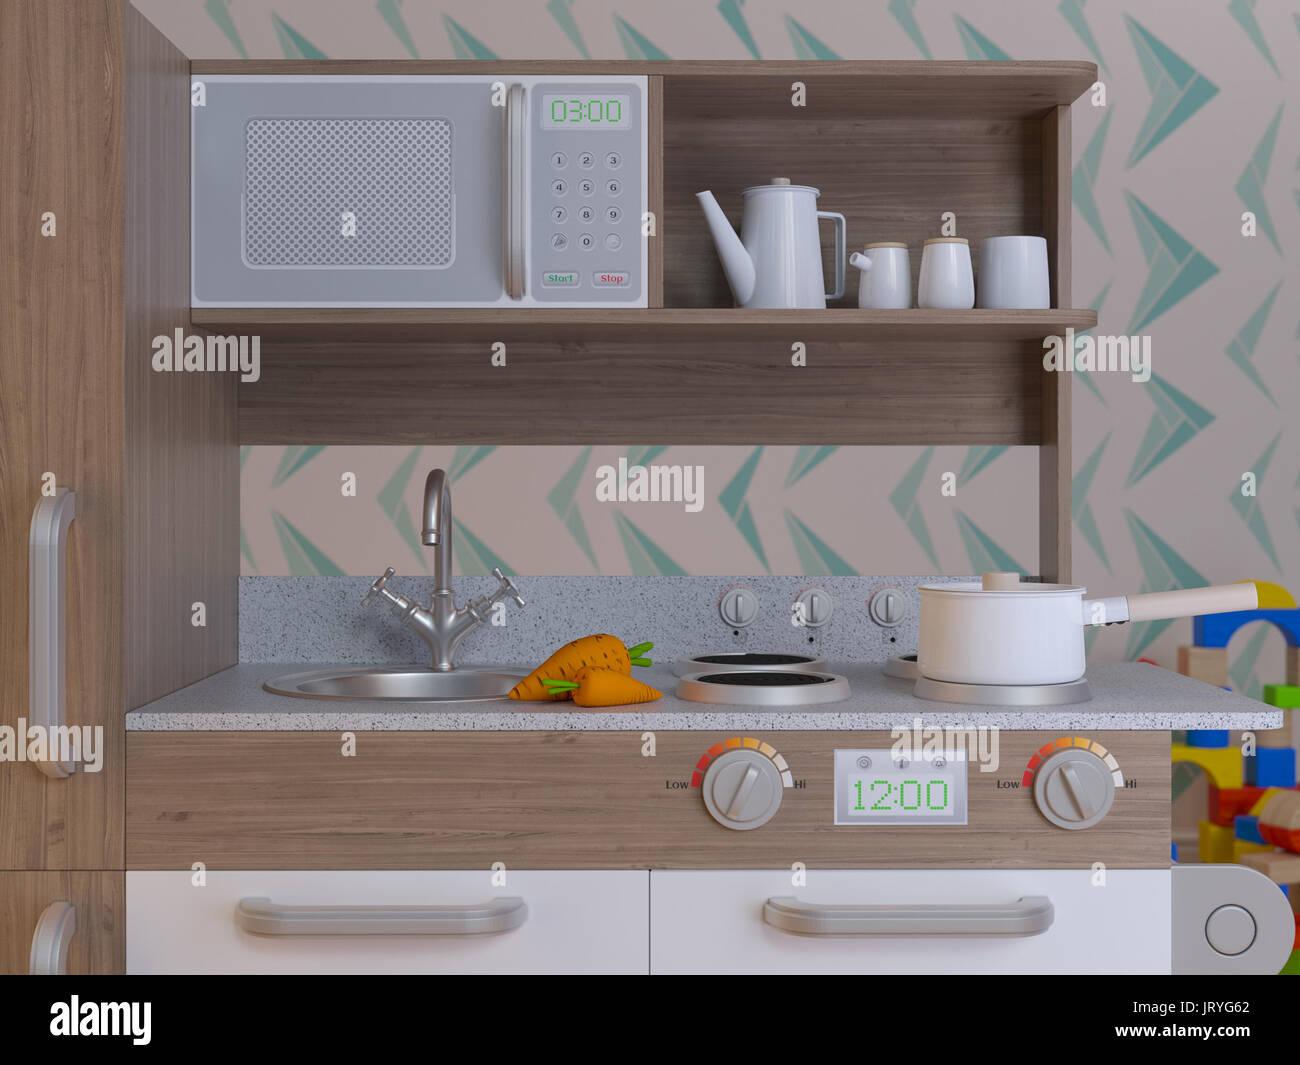 Children kitchen design interior for cooking pretend play set with accessories. 3d illustration kids kitchen smart playset. Render image - Stock Image